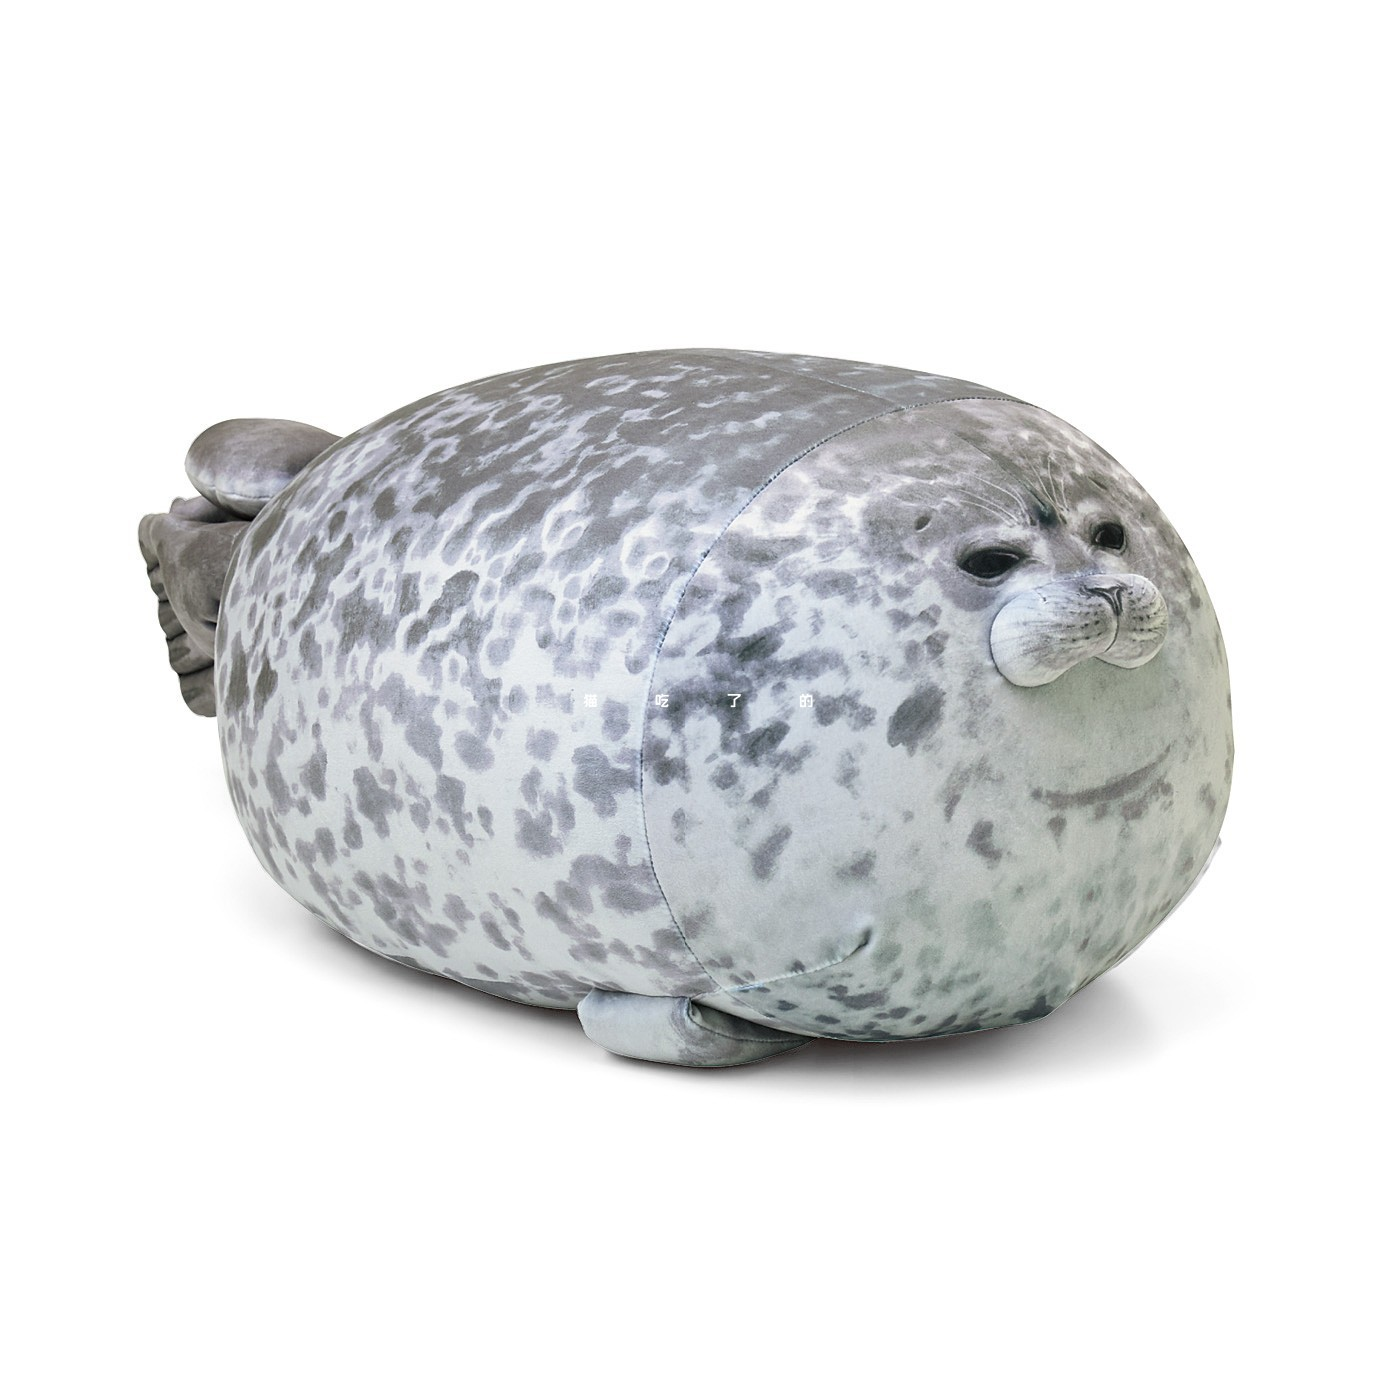 Seal Shaped Throw Pillows Kids Cute Cartoon Soft 3D Plush Sea World Animal Baby Sea Lion Plush Stuffed Sleeping Pillow Doll Toy(China)